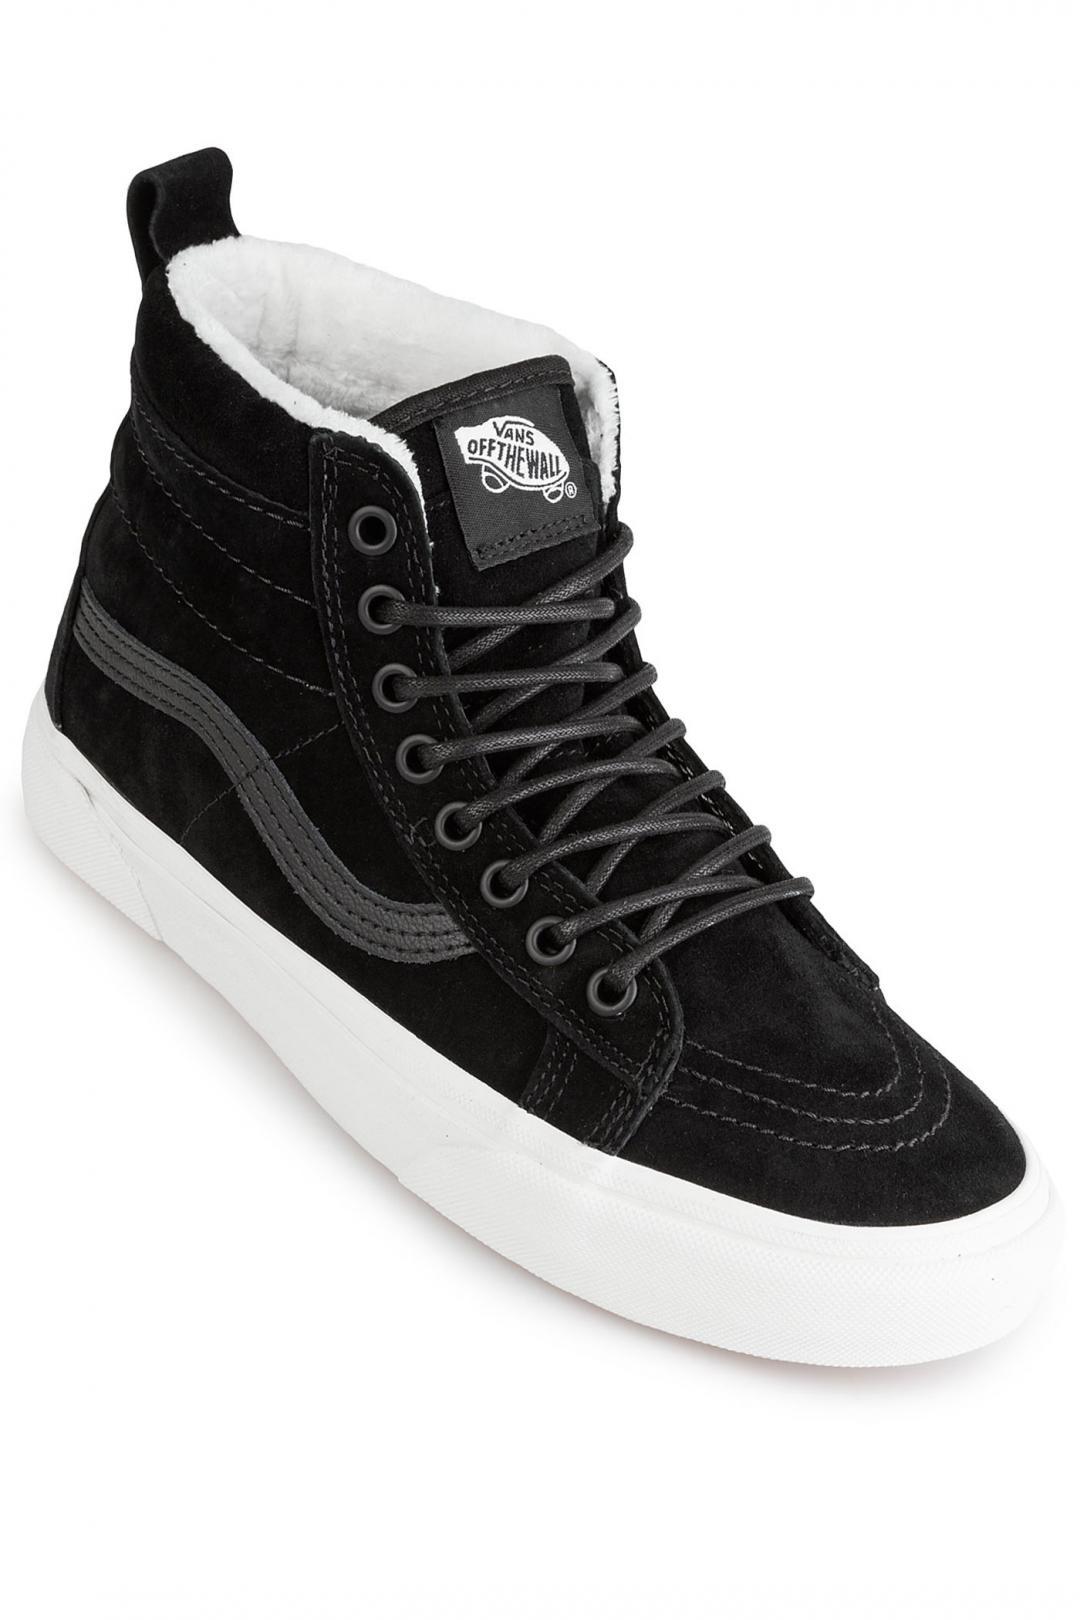 Donna Vans Sk8-Hi MTE black black marshmallow | Sneaker